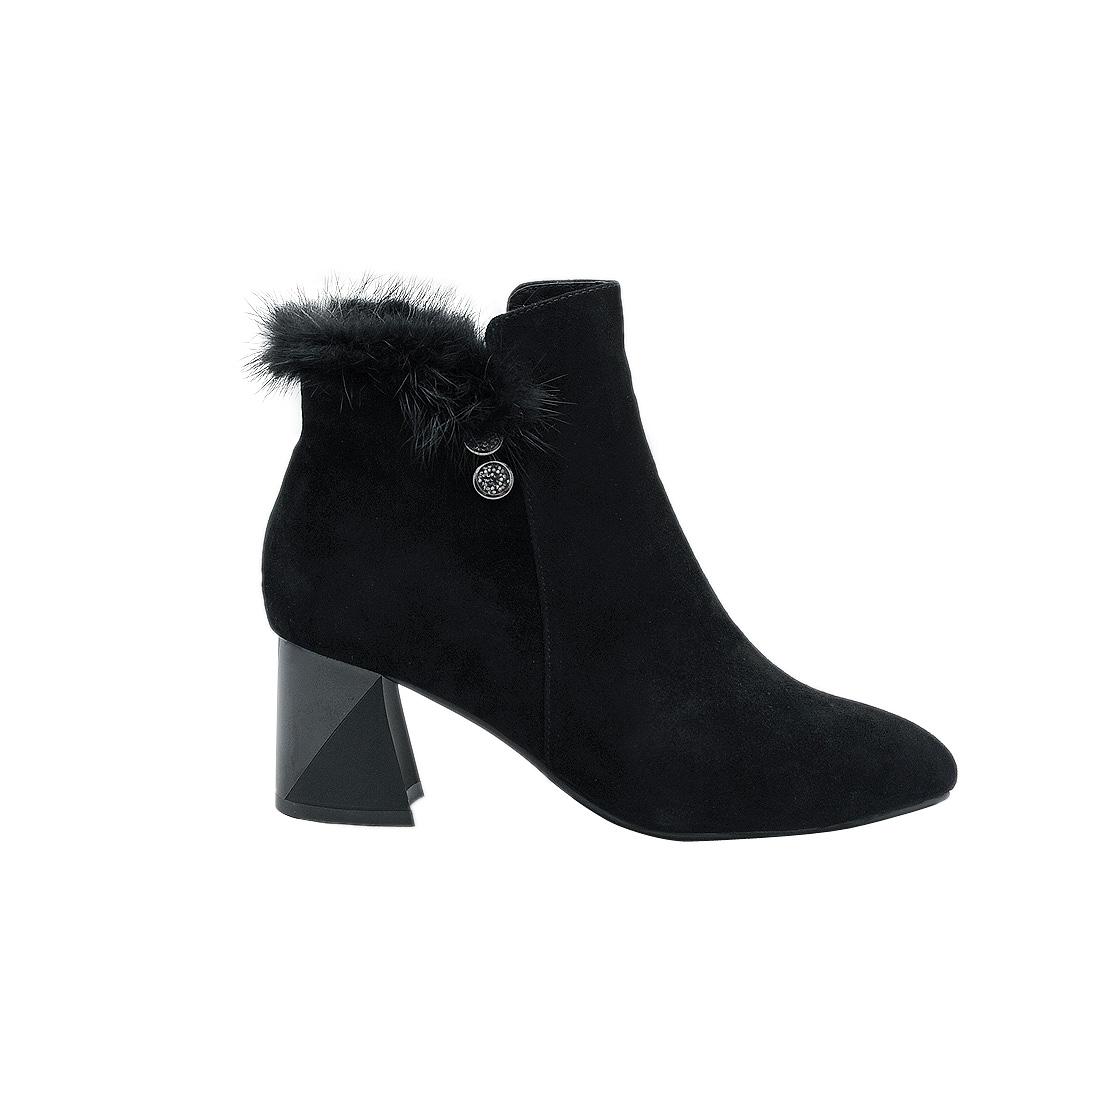 Giày bốt nữ da bò thật cao cấp ESW258